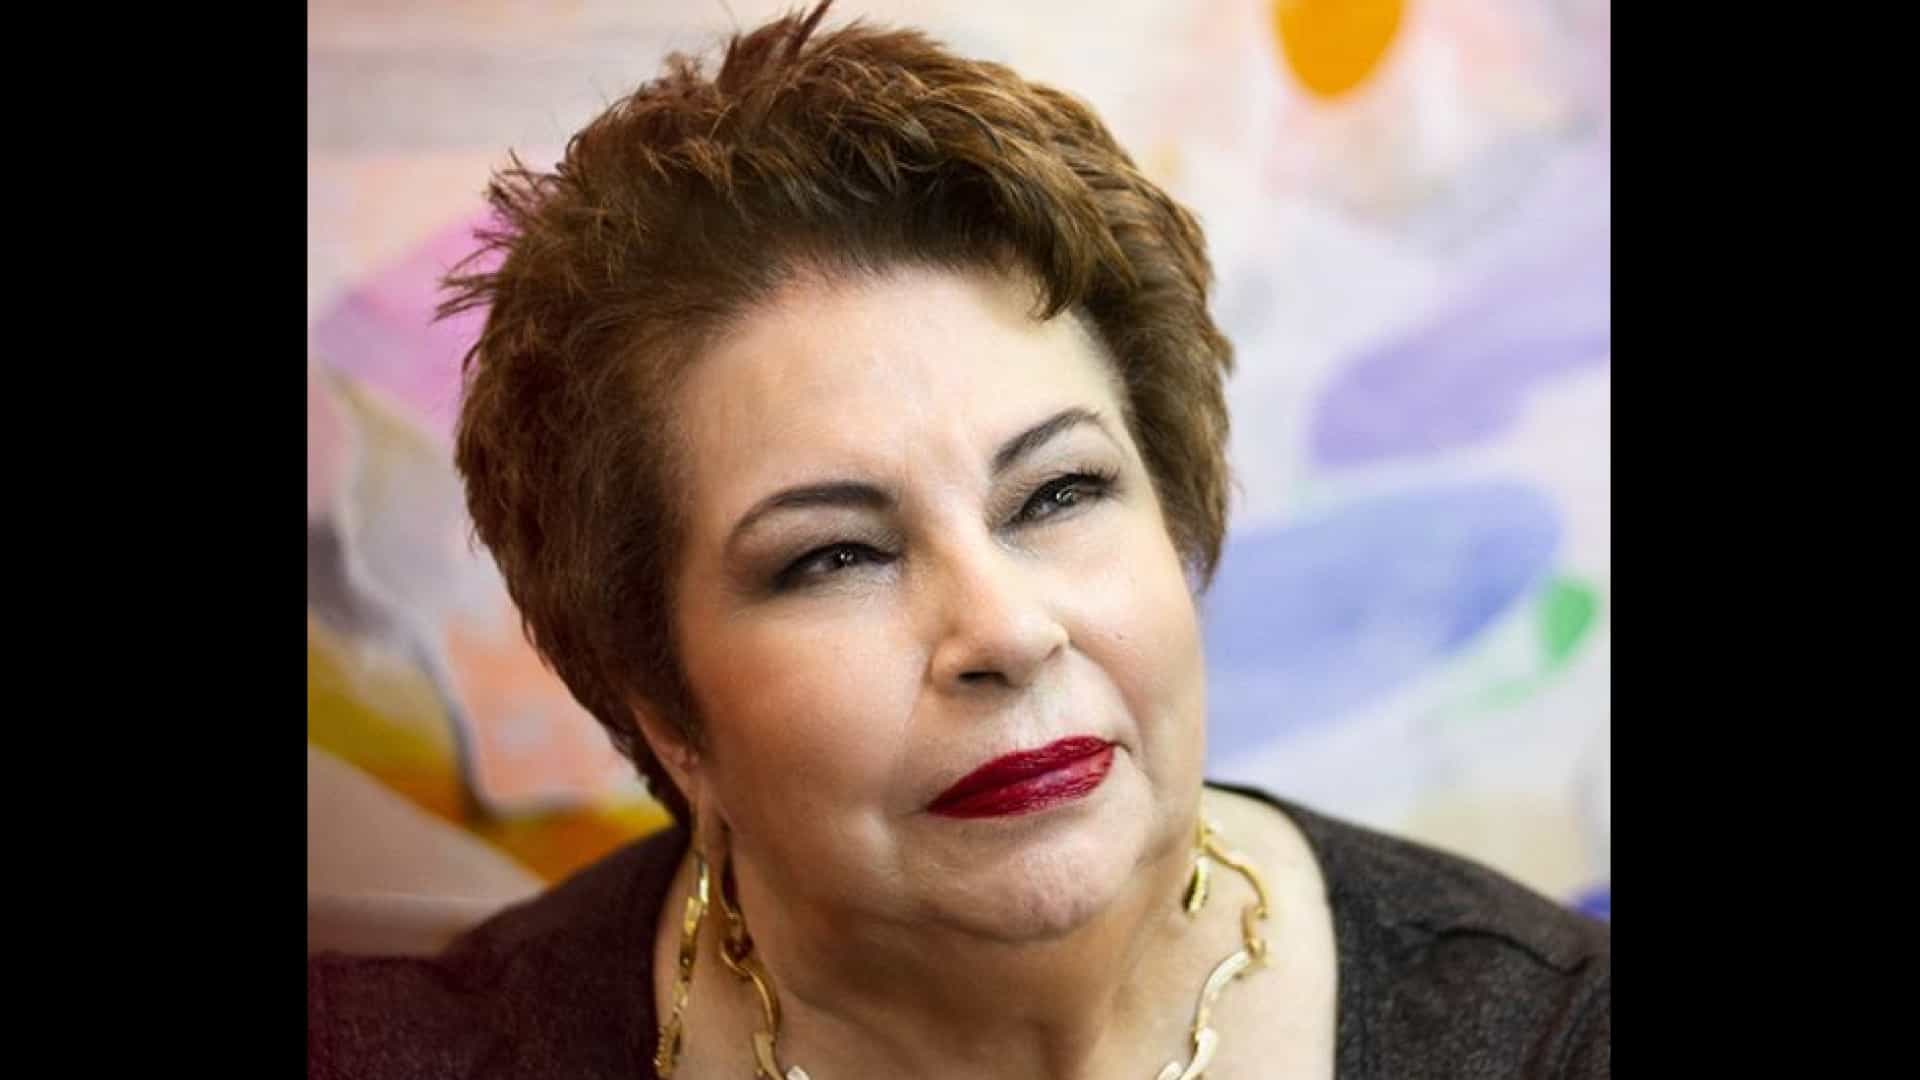 Nana Caymmi ataca Chico, Gil e Caetano: 'Tudo chupador de p** de Lula'